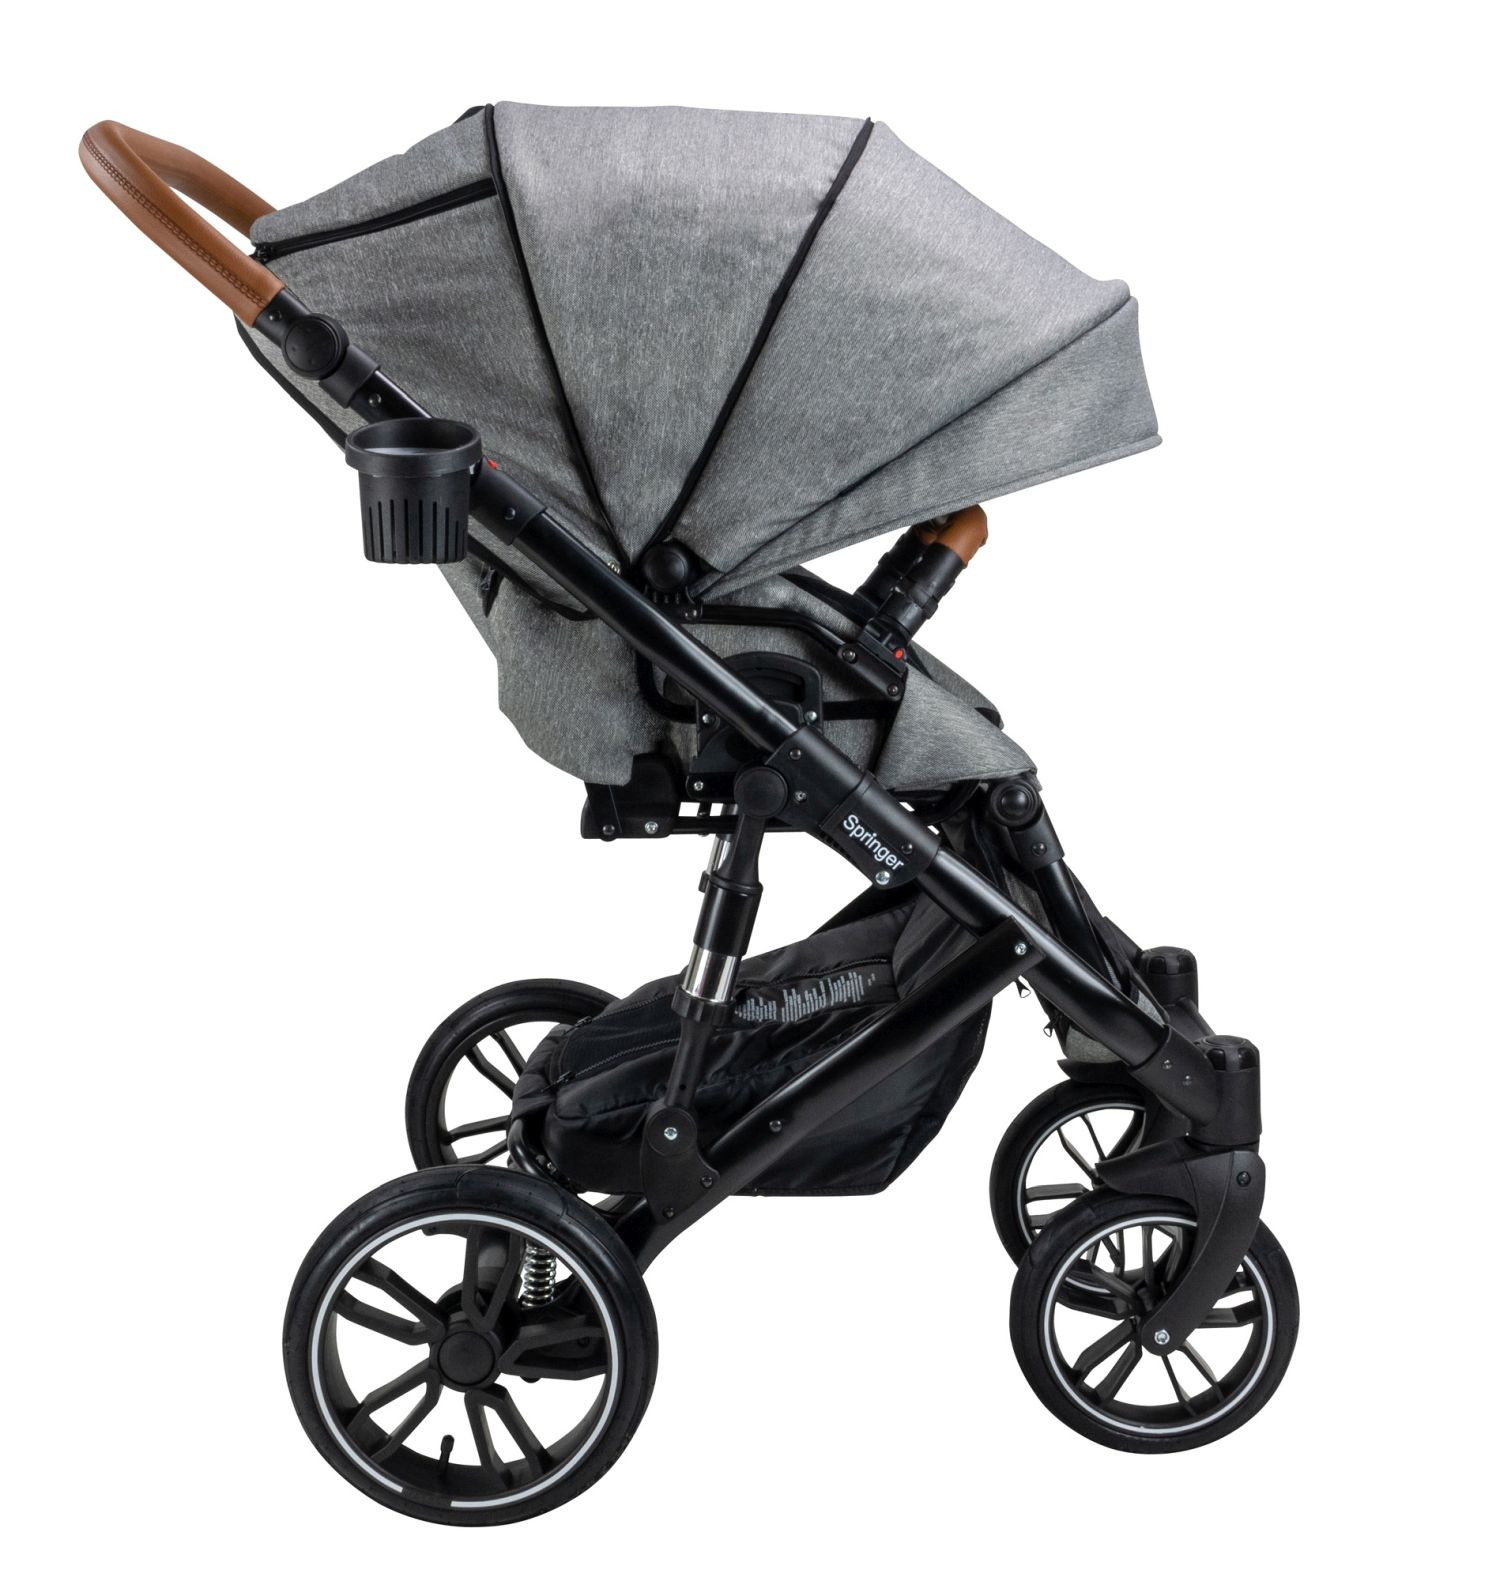 Sonnenschirm Springer Kinderwagen